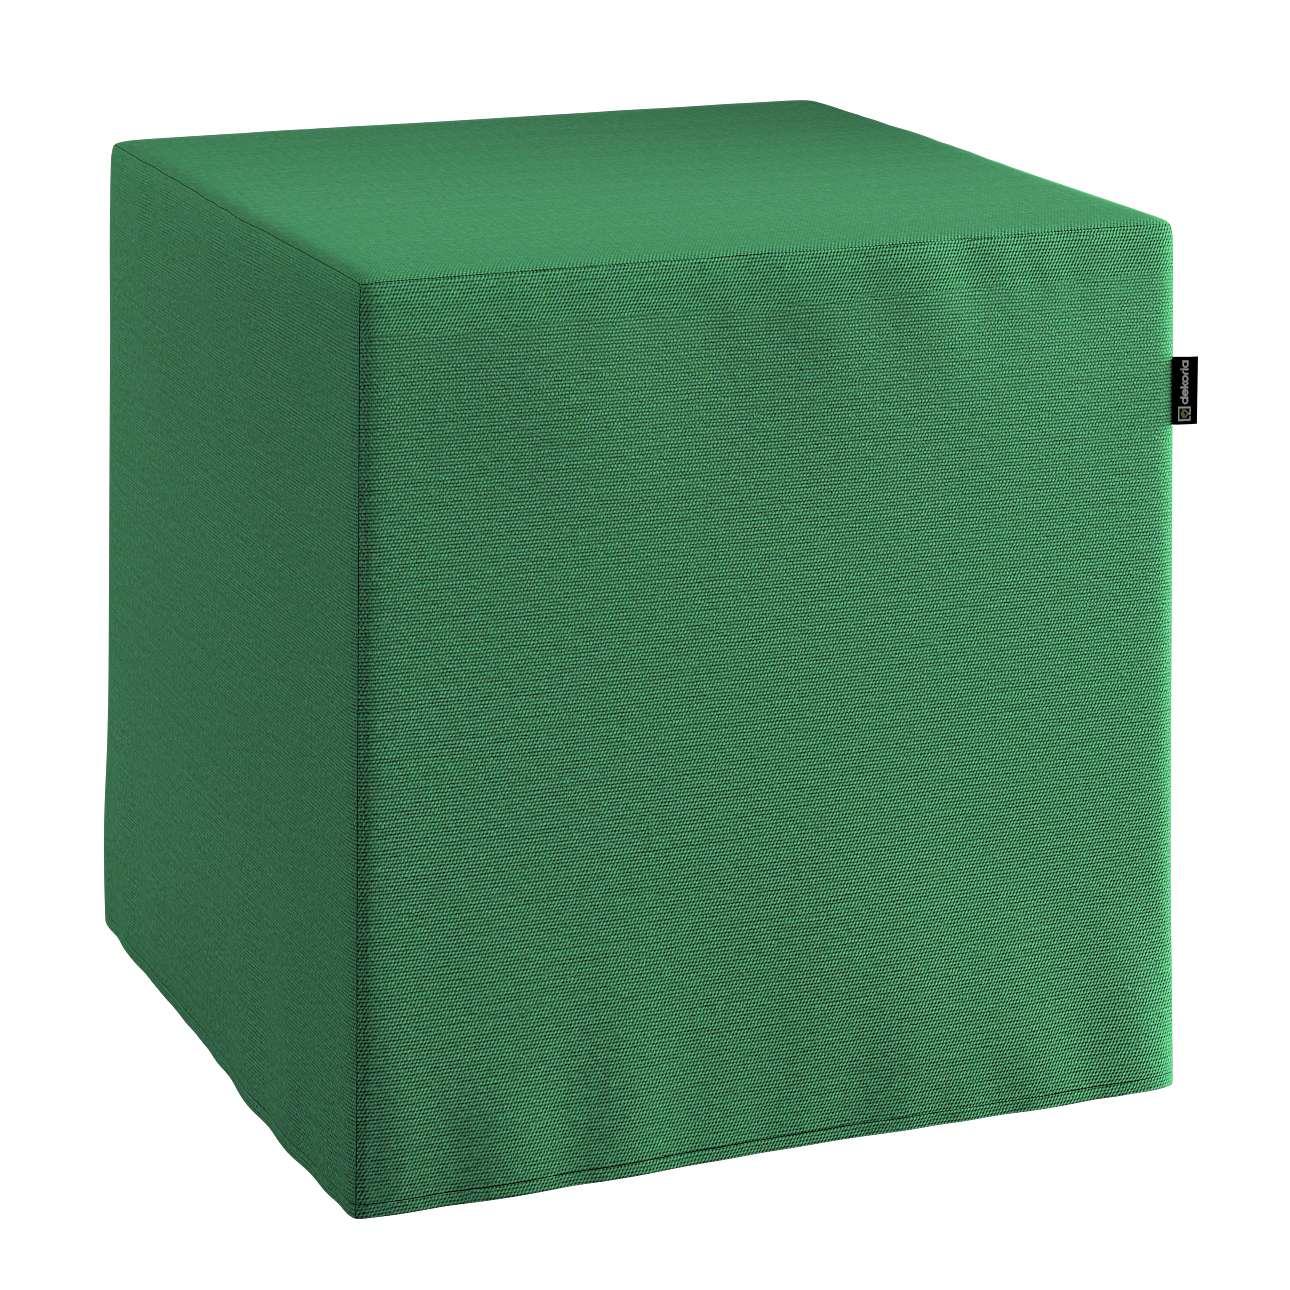 Sedák Cube - kostka pevná 40x40x40 v kolekci Loneta, látka: 133-18